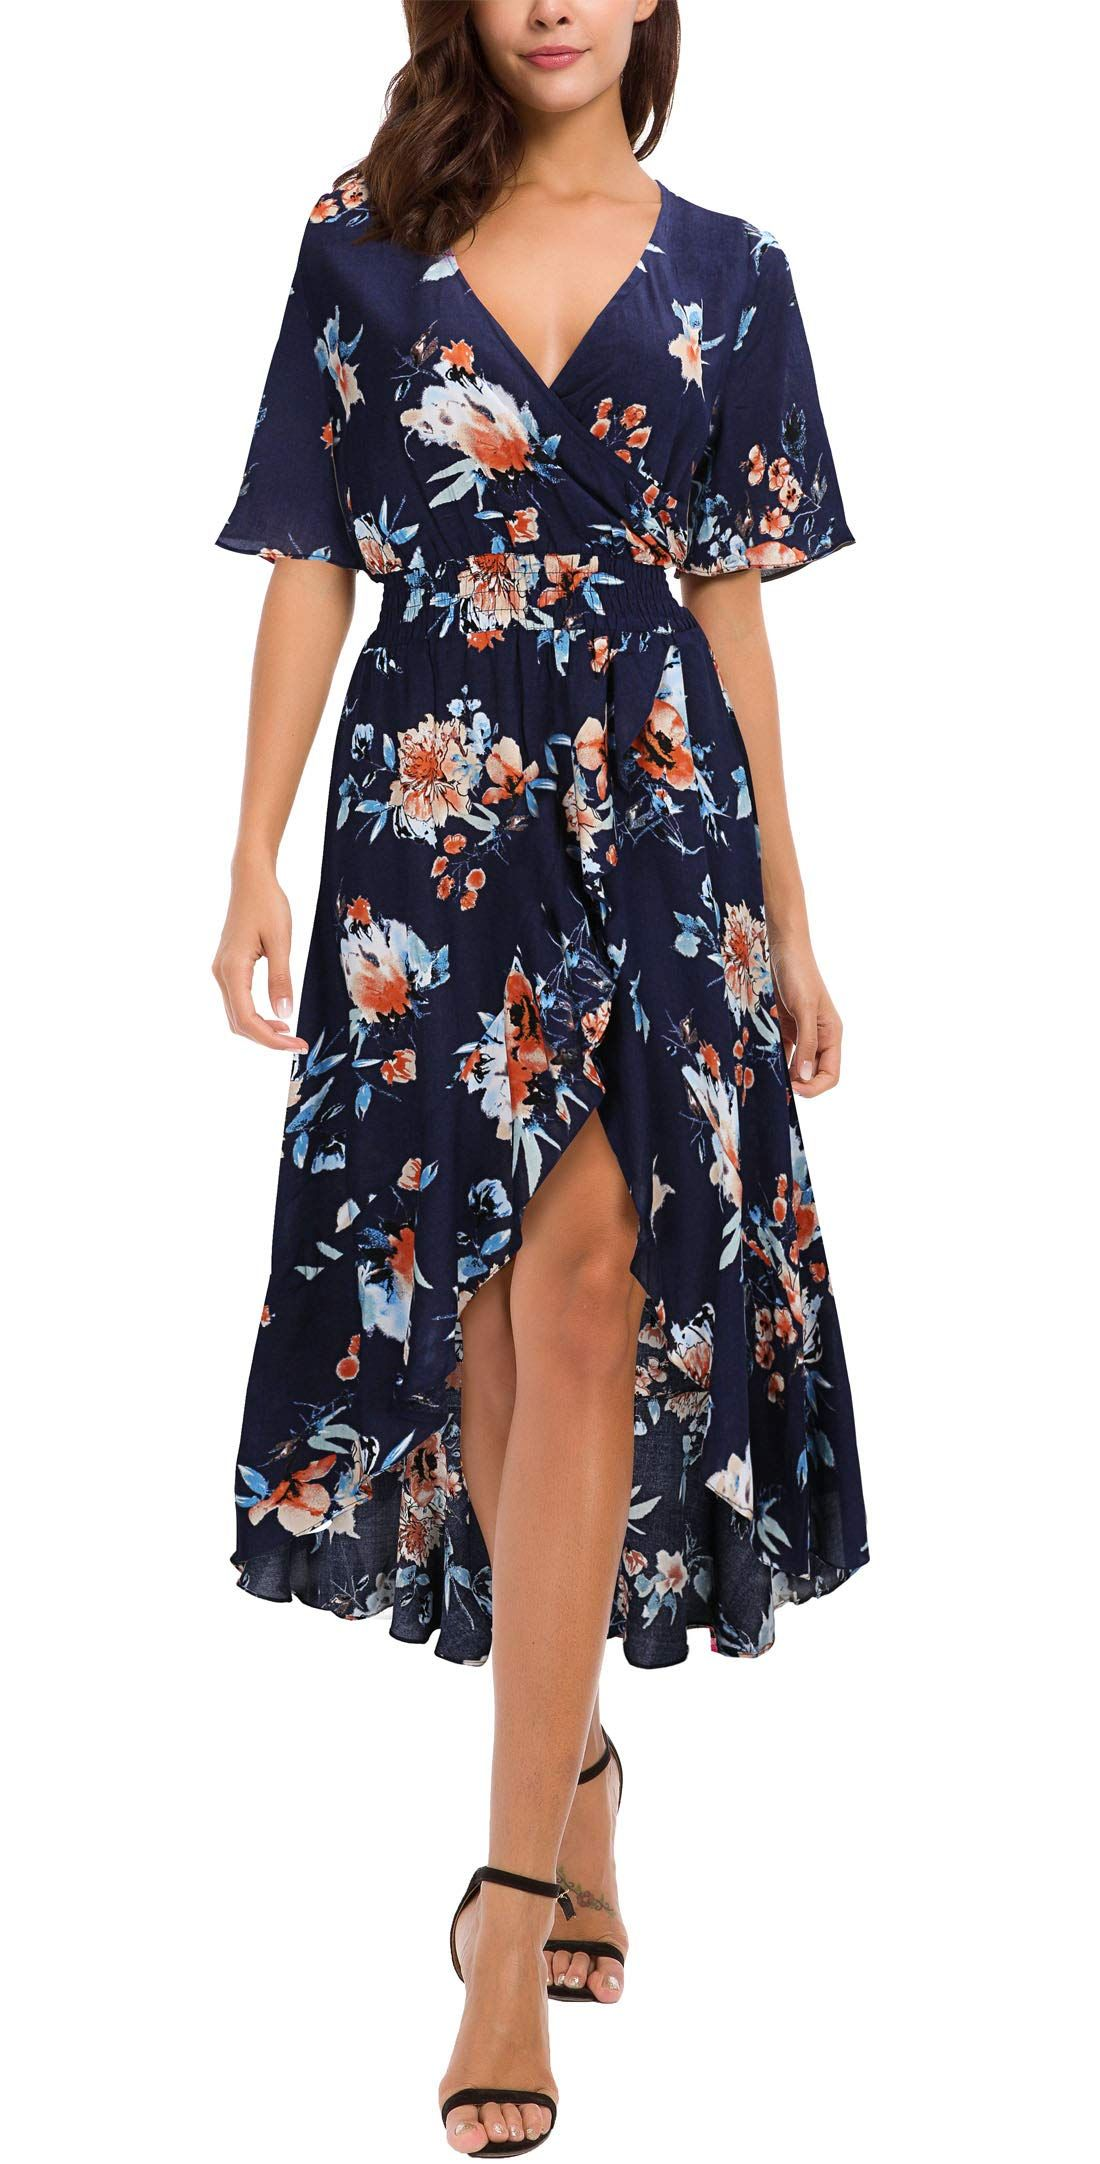 Kormei Womens Short Sleeve Floral High Low V Neck Flowy Party Long Maxi Dress Maxi Dress Wedding Long Maxi Dress Maxi Dress [ 2164 x 1100 Pixel ]